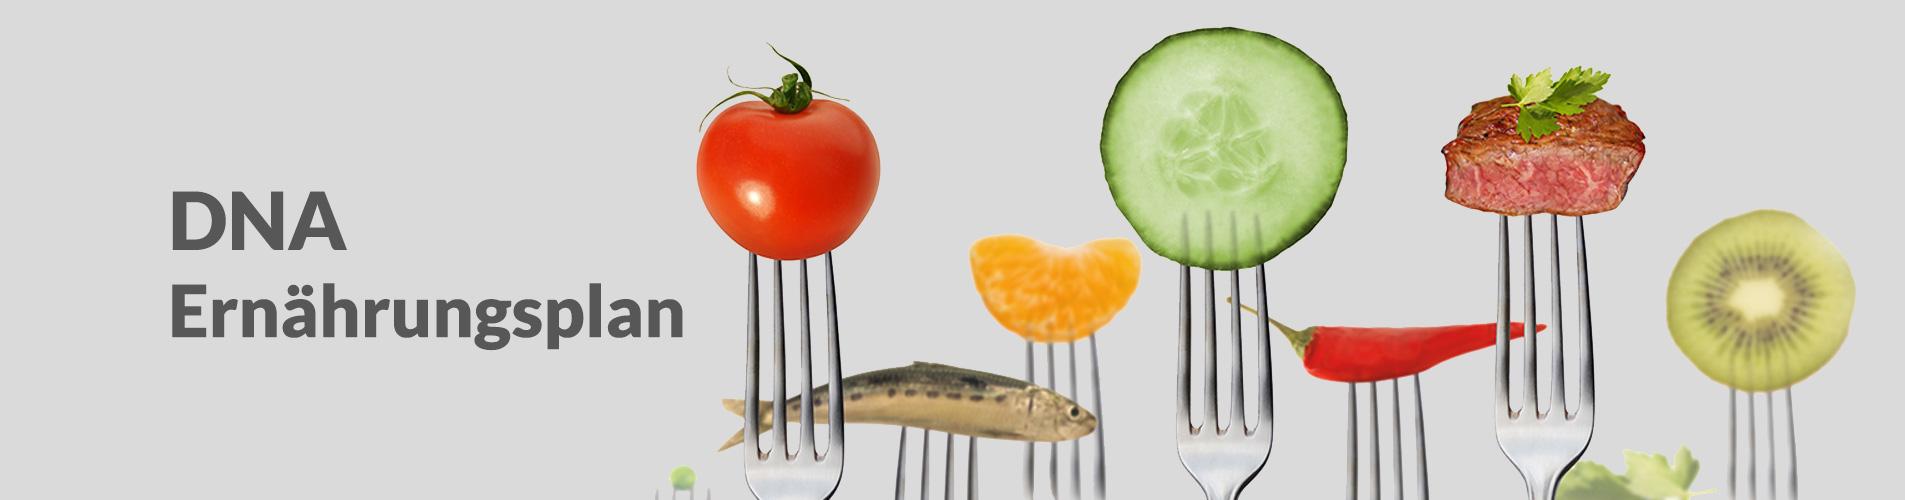 Slider-DNA-Ernährungsplan2